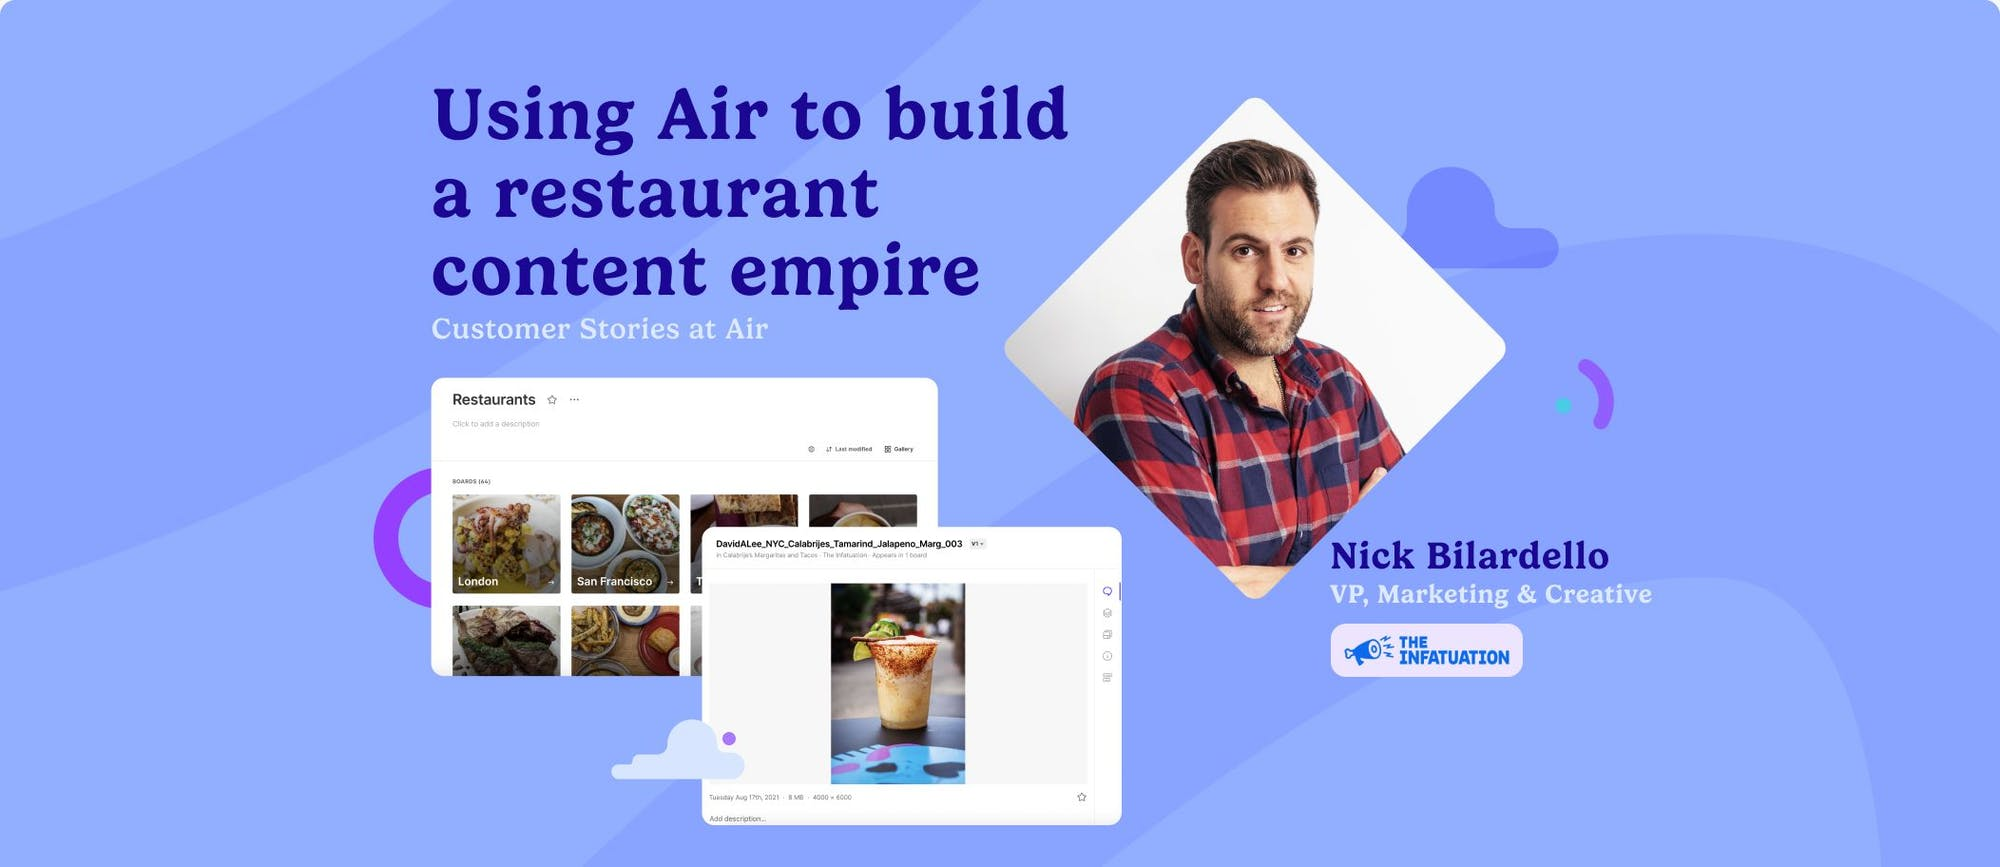 Using Air to build a restaurant content empire —Customer Stories at Air —Nick Bilardello, VP, Marketing & Creative, The Infatuation